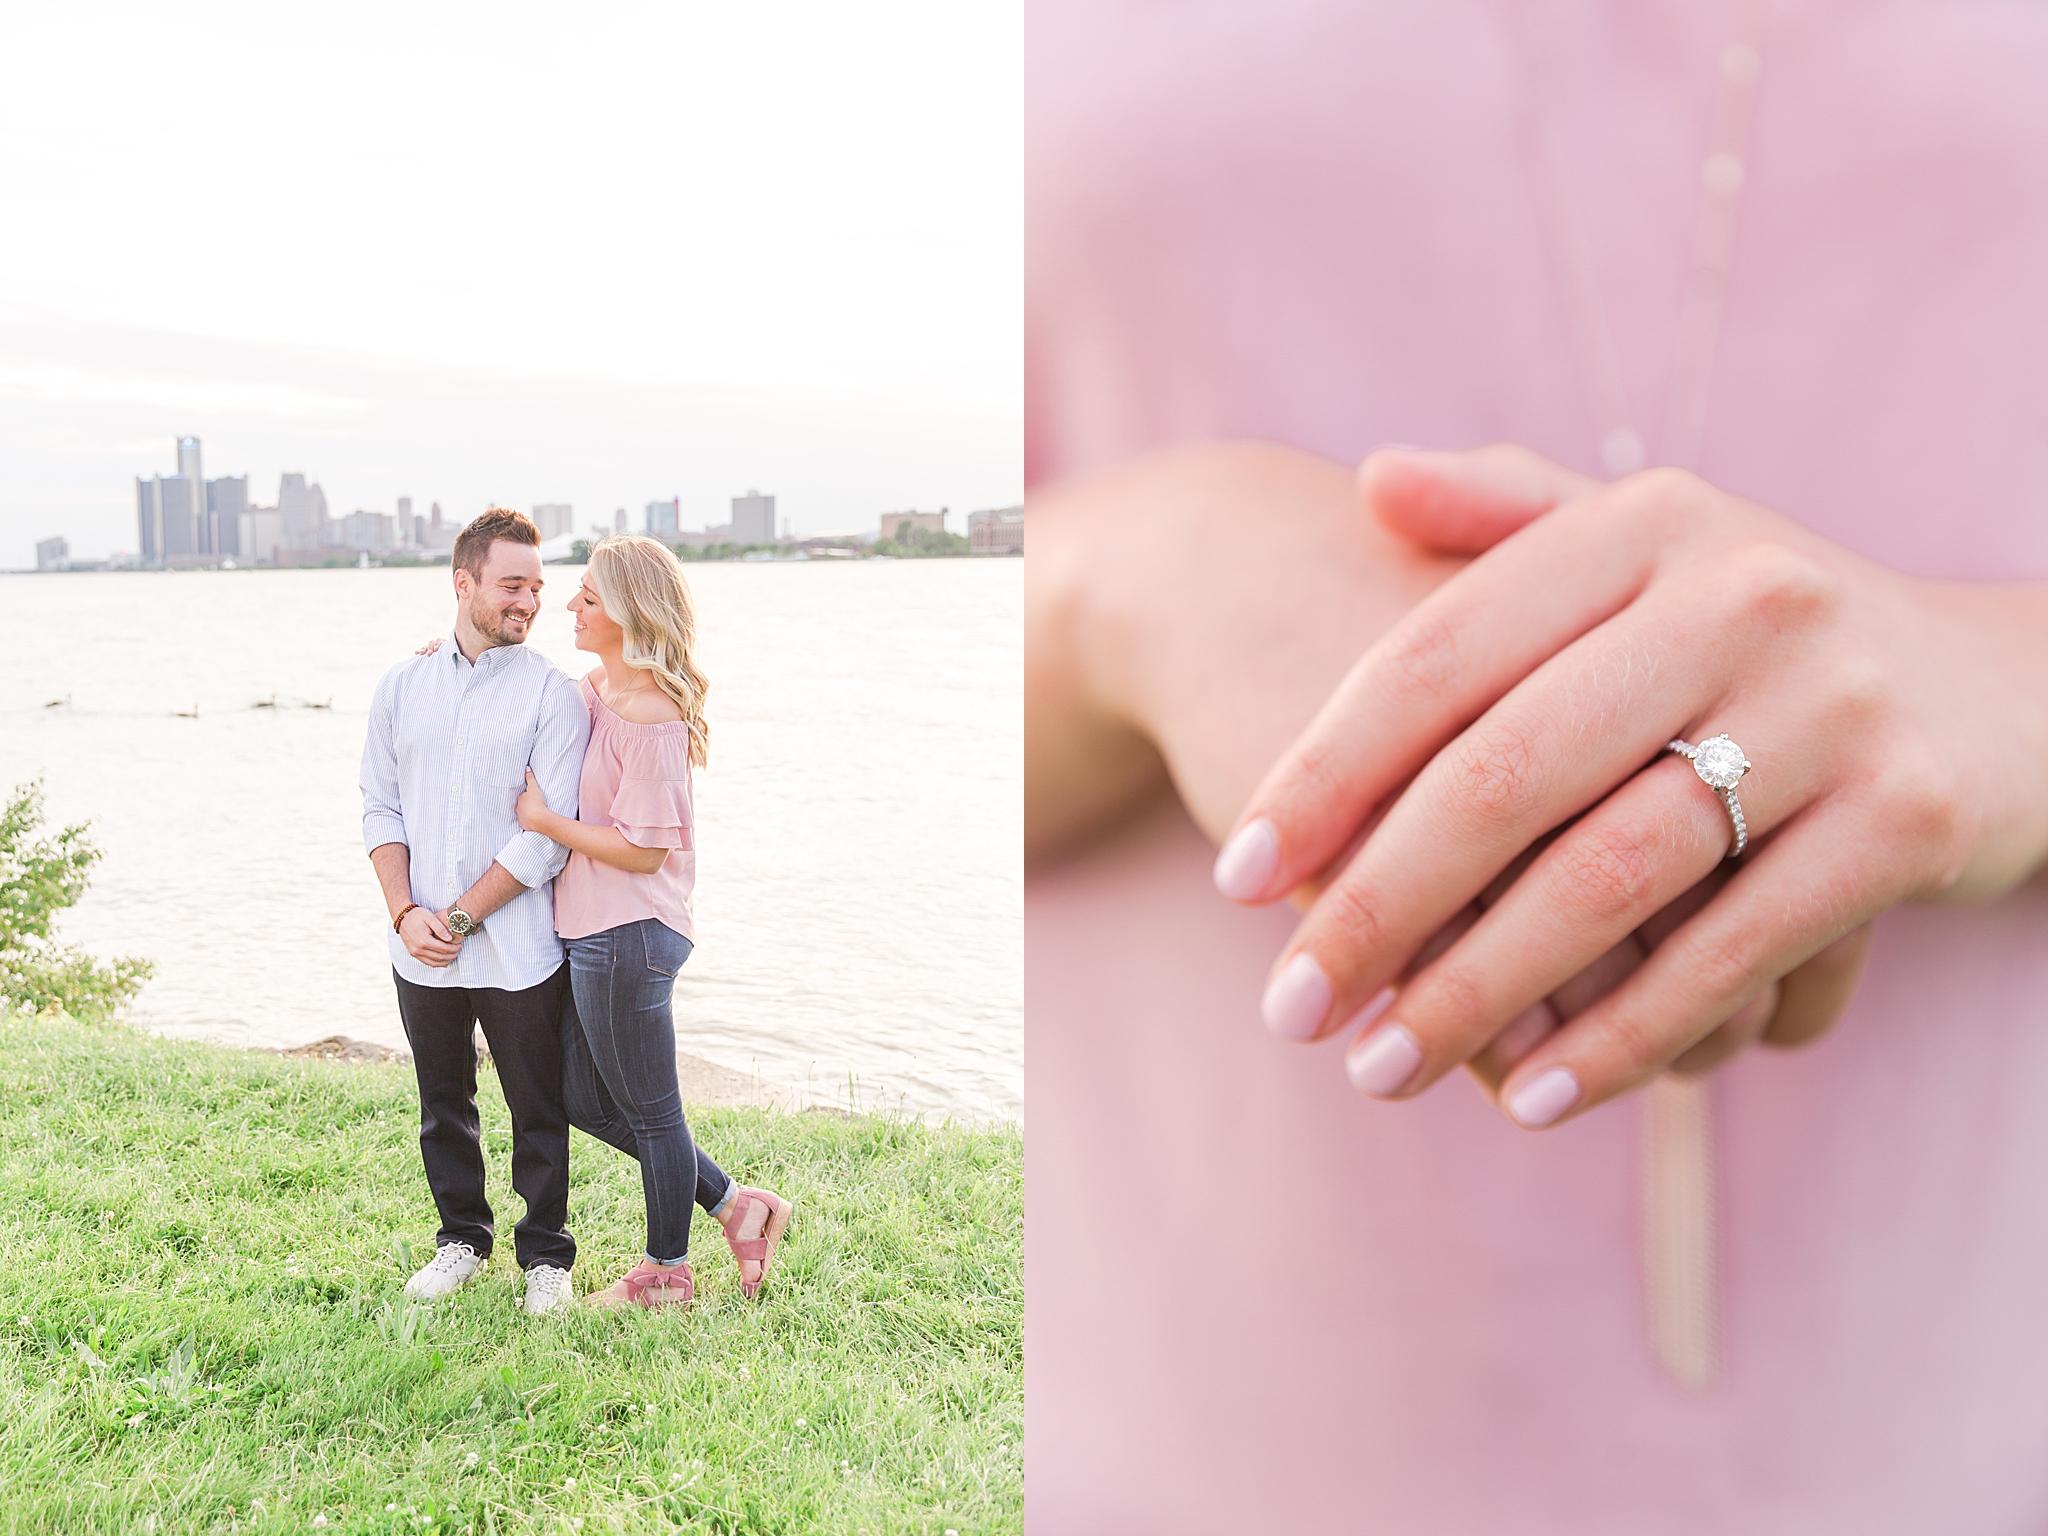 detroit-wedding-photographer-downtown-detroit-belle-isle-engagement-photos-sarah-eric-by-courtney-carolyn-photography_0037.jpg